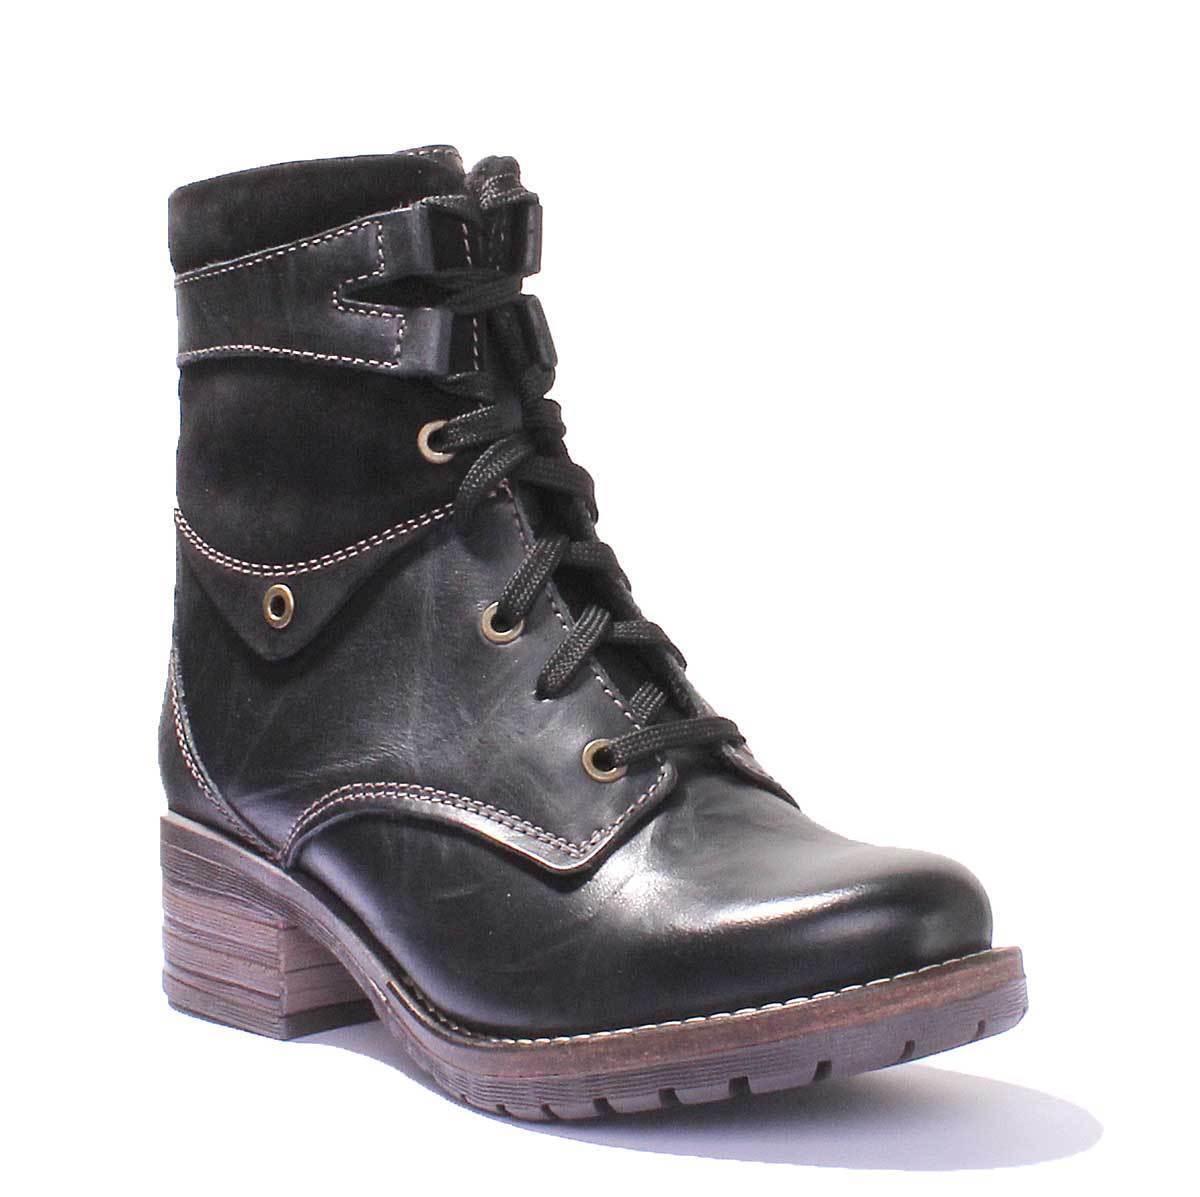 Dromedaris Kara Womens Black Waxy Creased Leather Boots UK Size 3 - 8